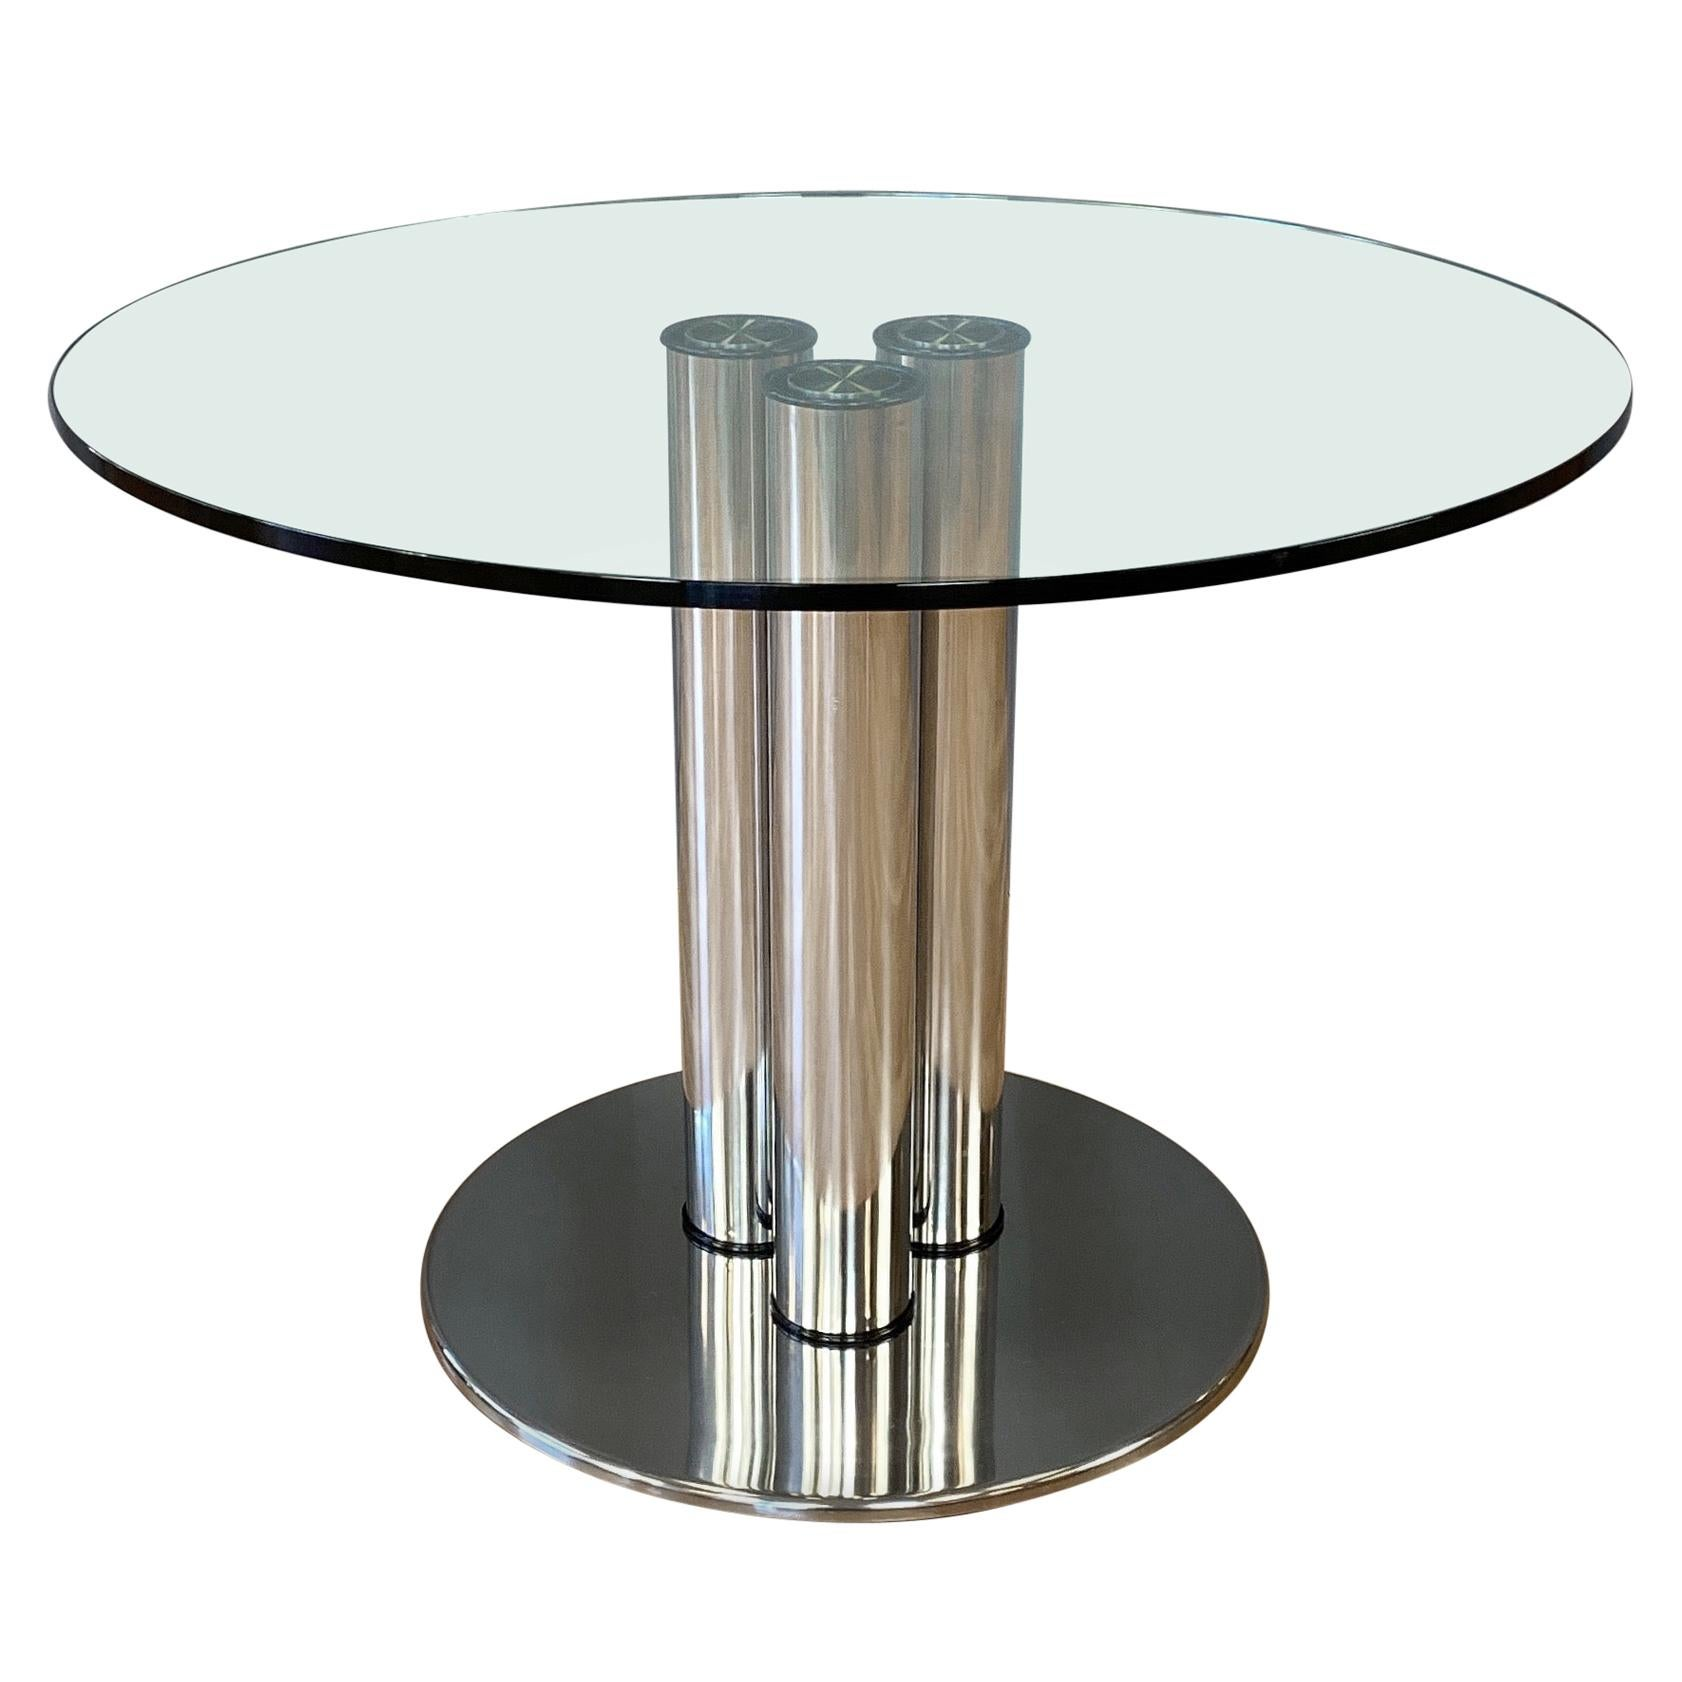 Marco Zanuso for Zanotta 2532 Marcuso Steel and Glass Dining Table, 1970